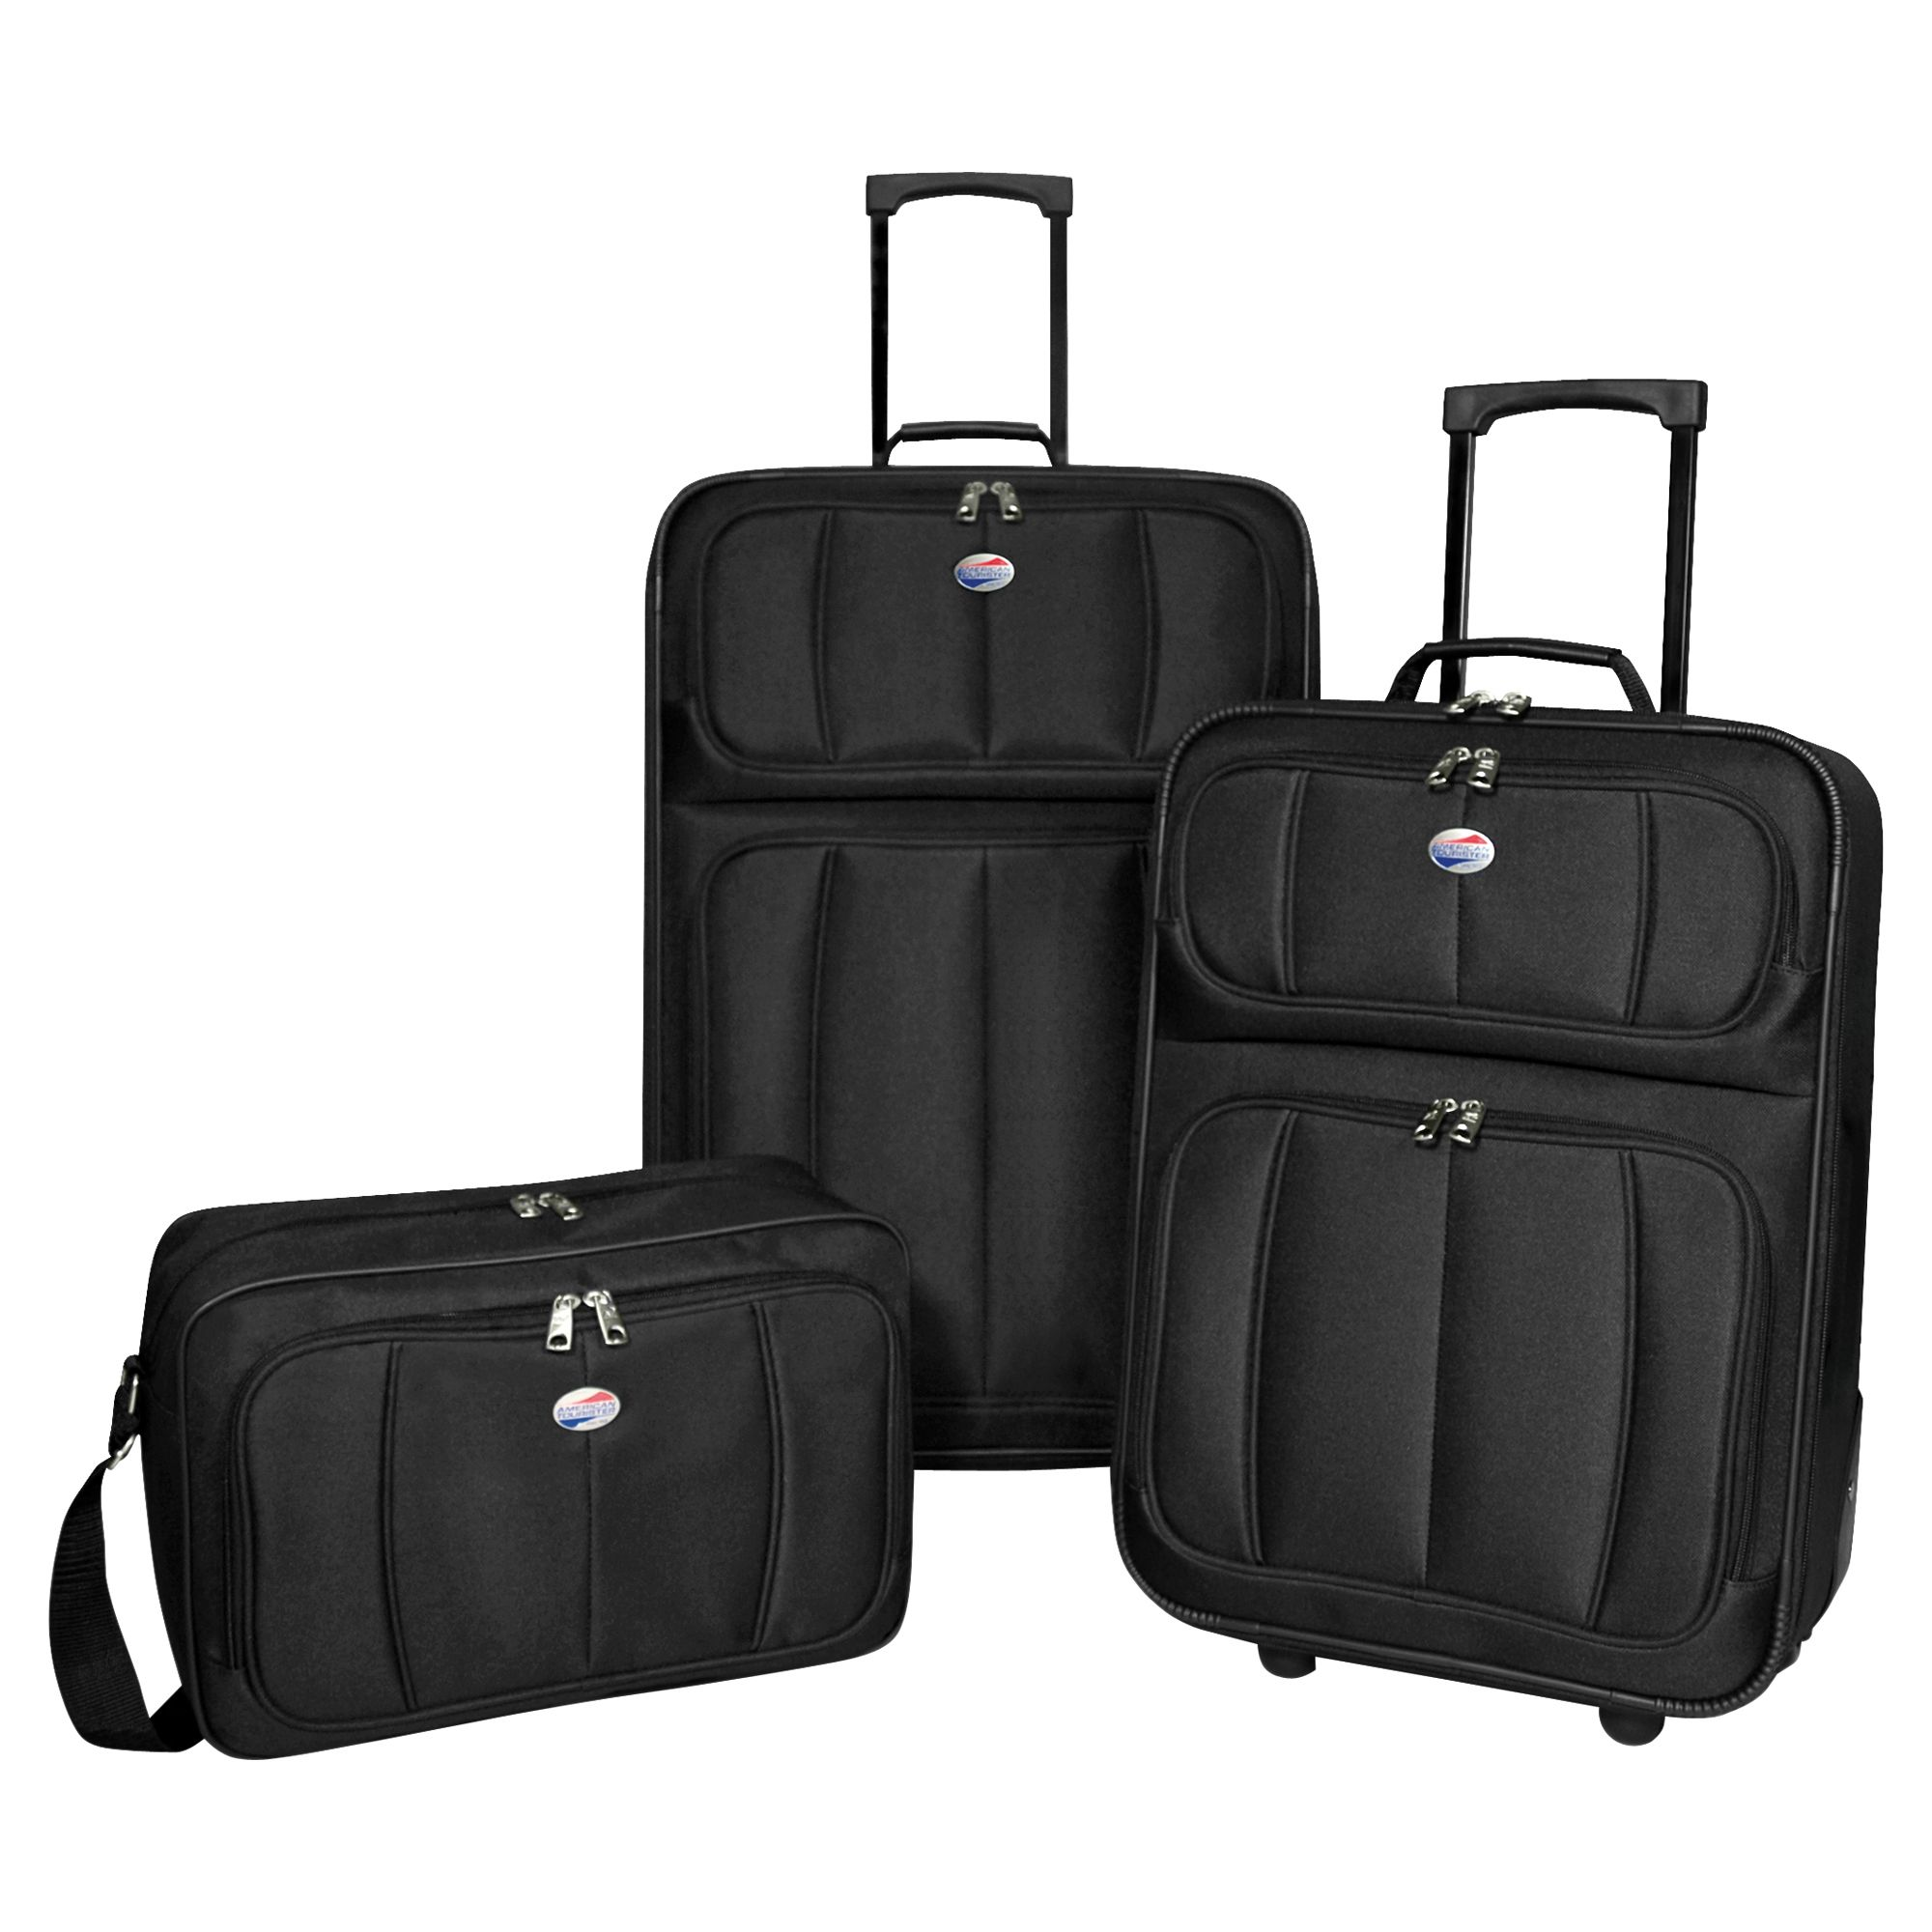 American Tourister 3 Pc. Black Luggage Set